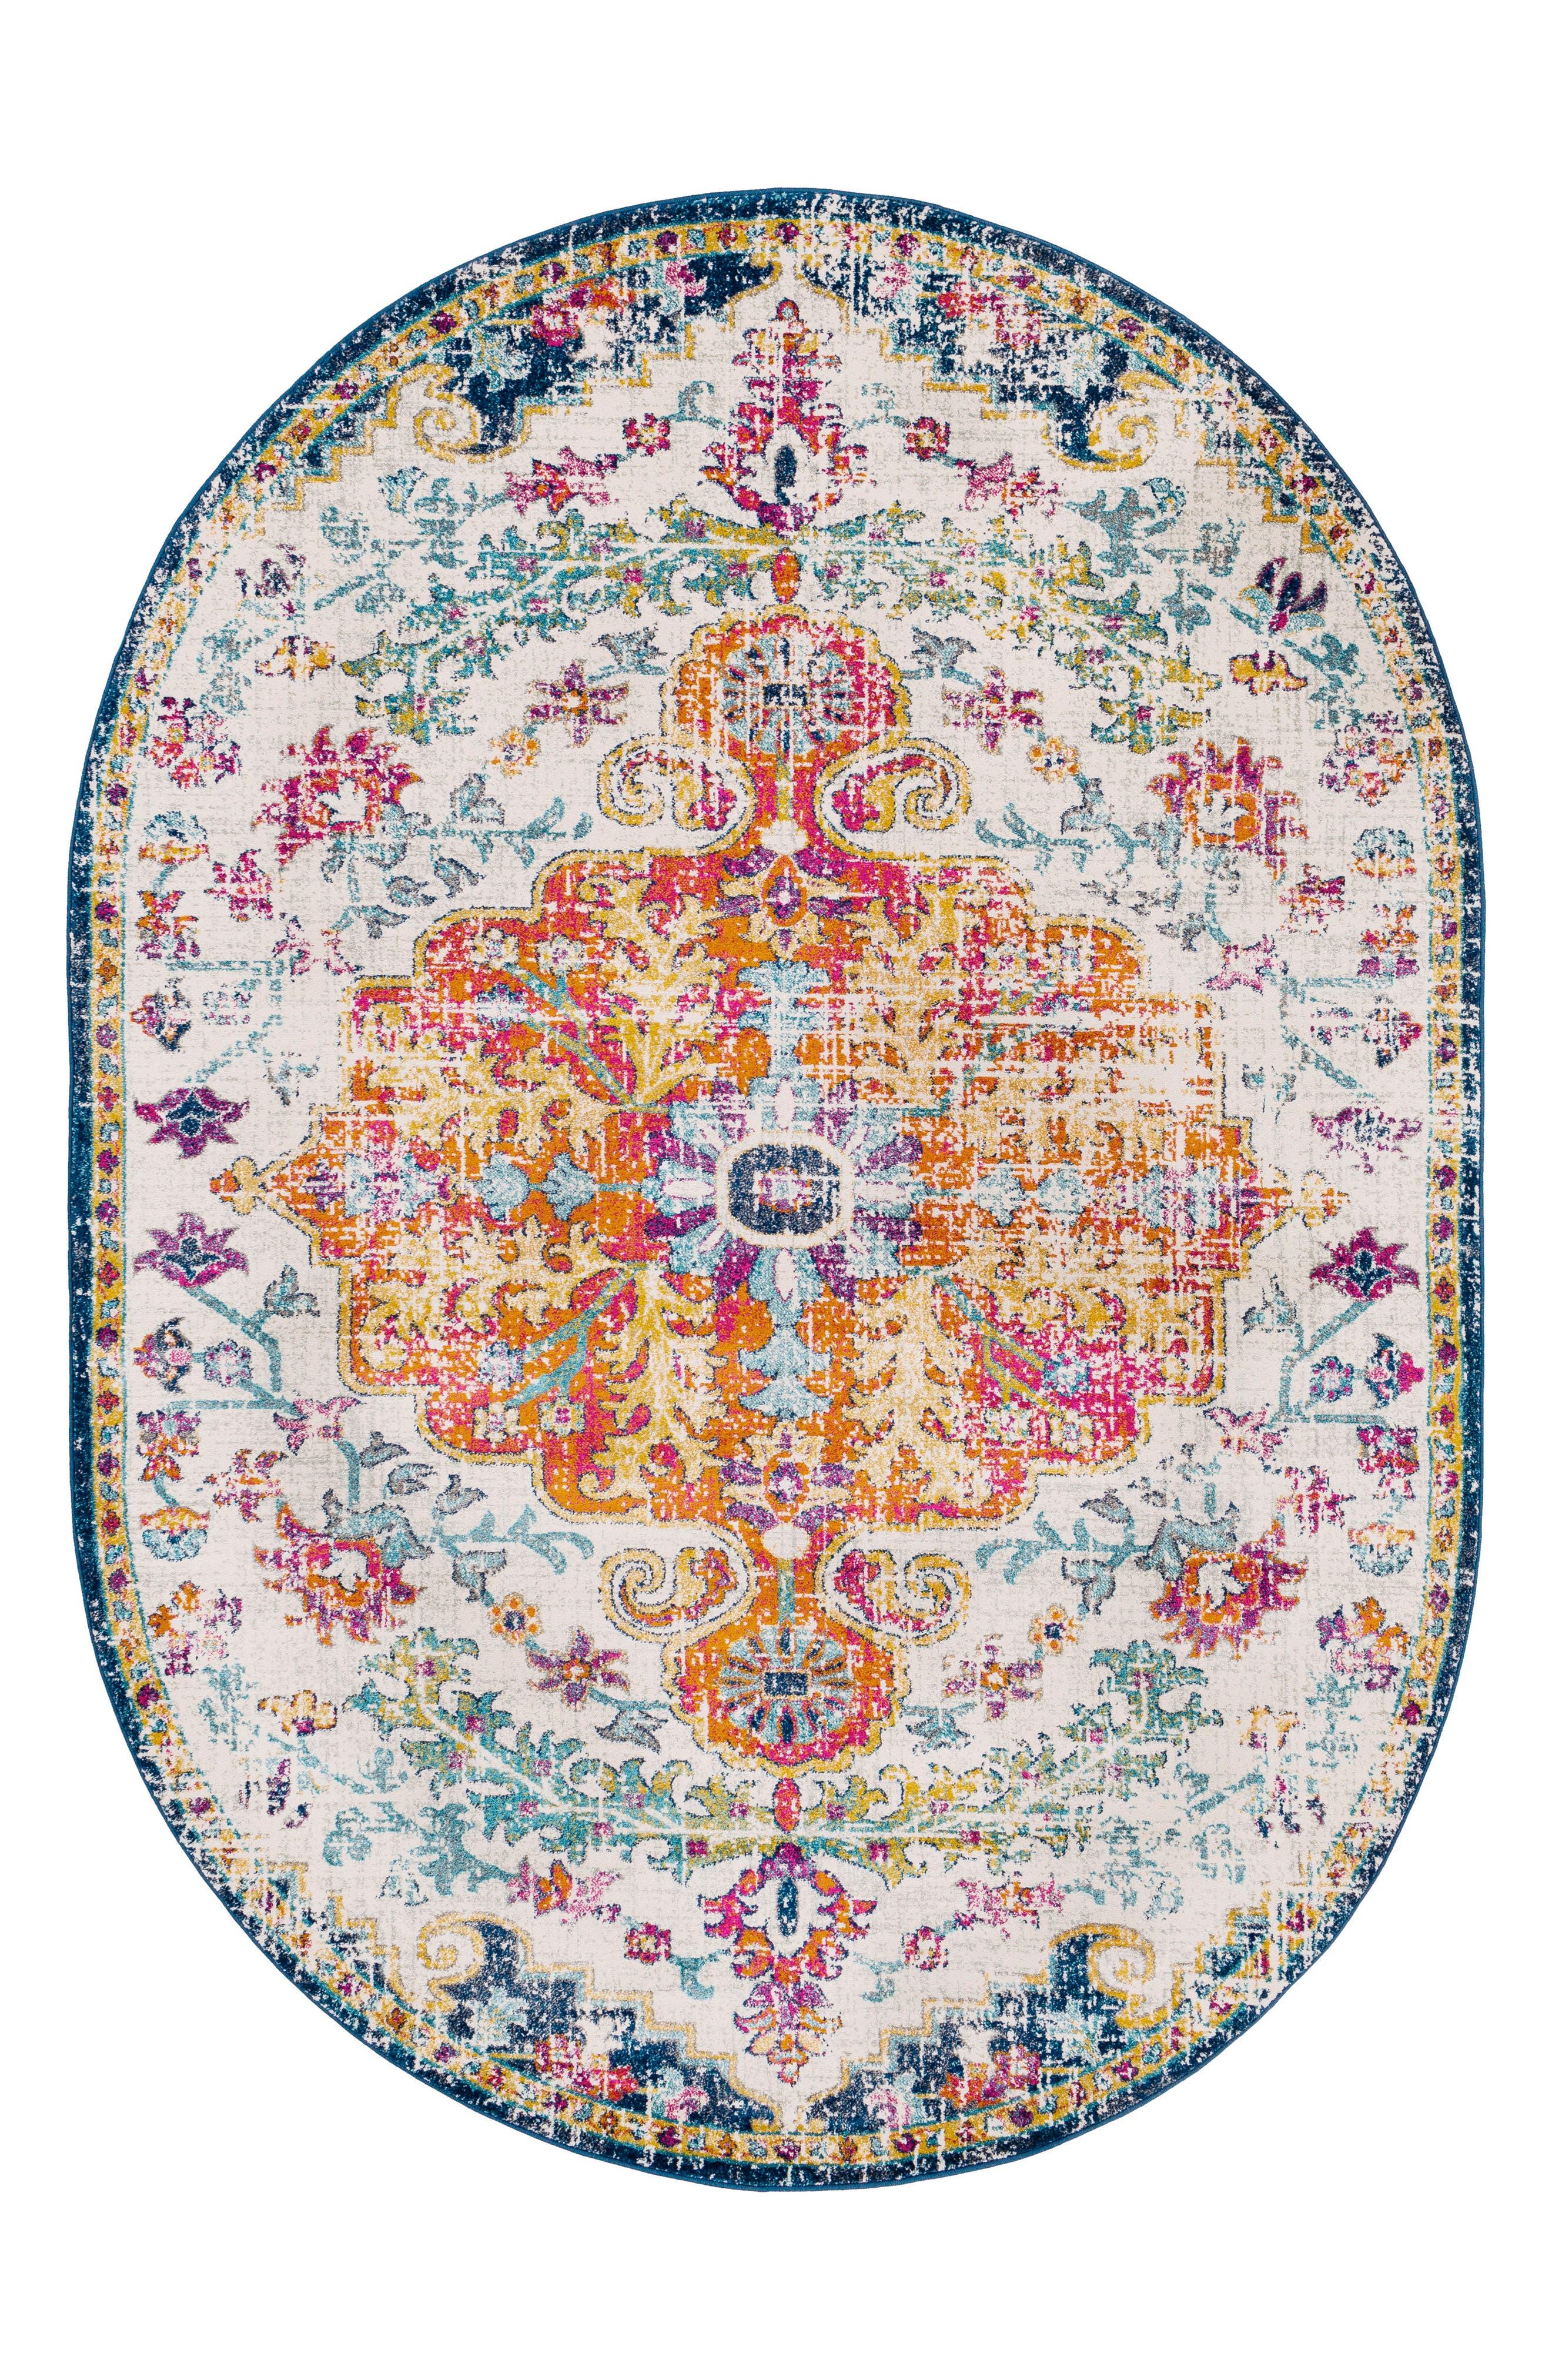 Harput Area Rug,                             Alternate thumbnail 7, color,                             YELLOW